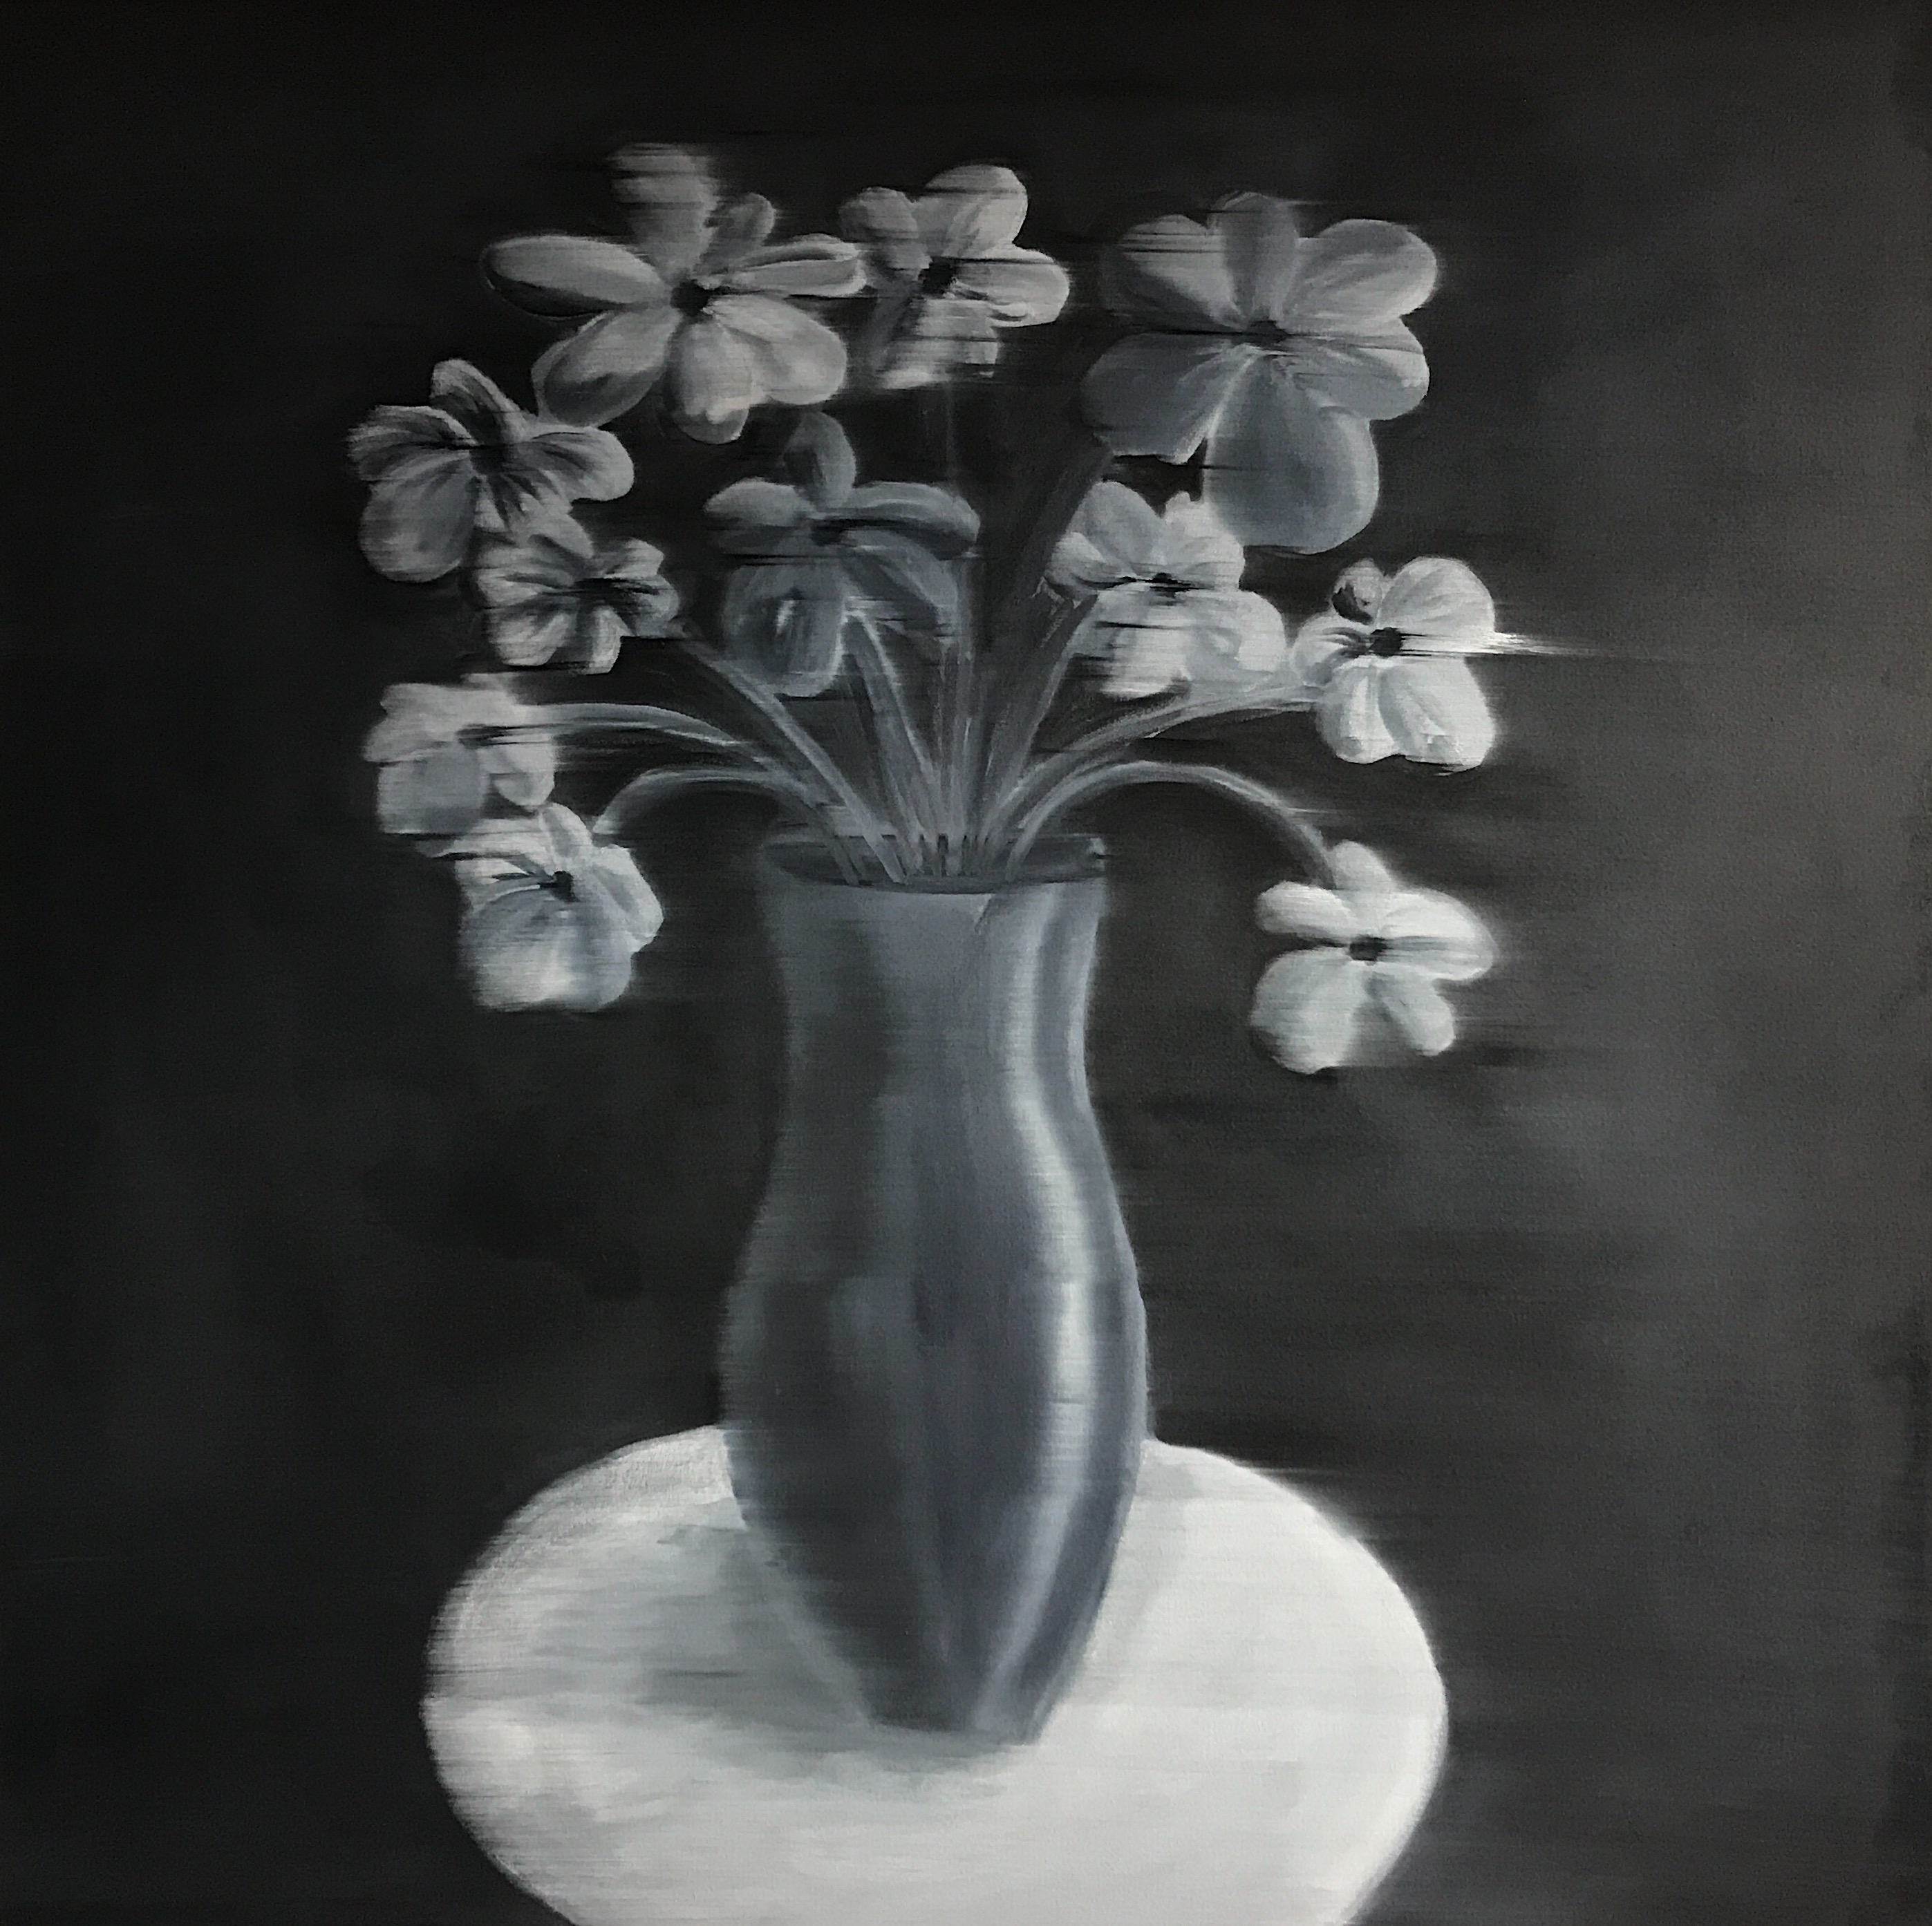 Flowers, 2019